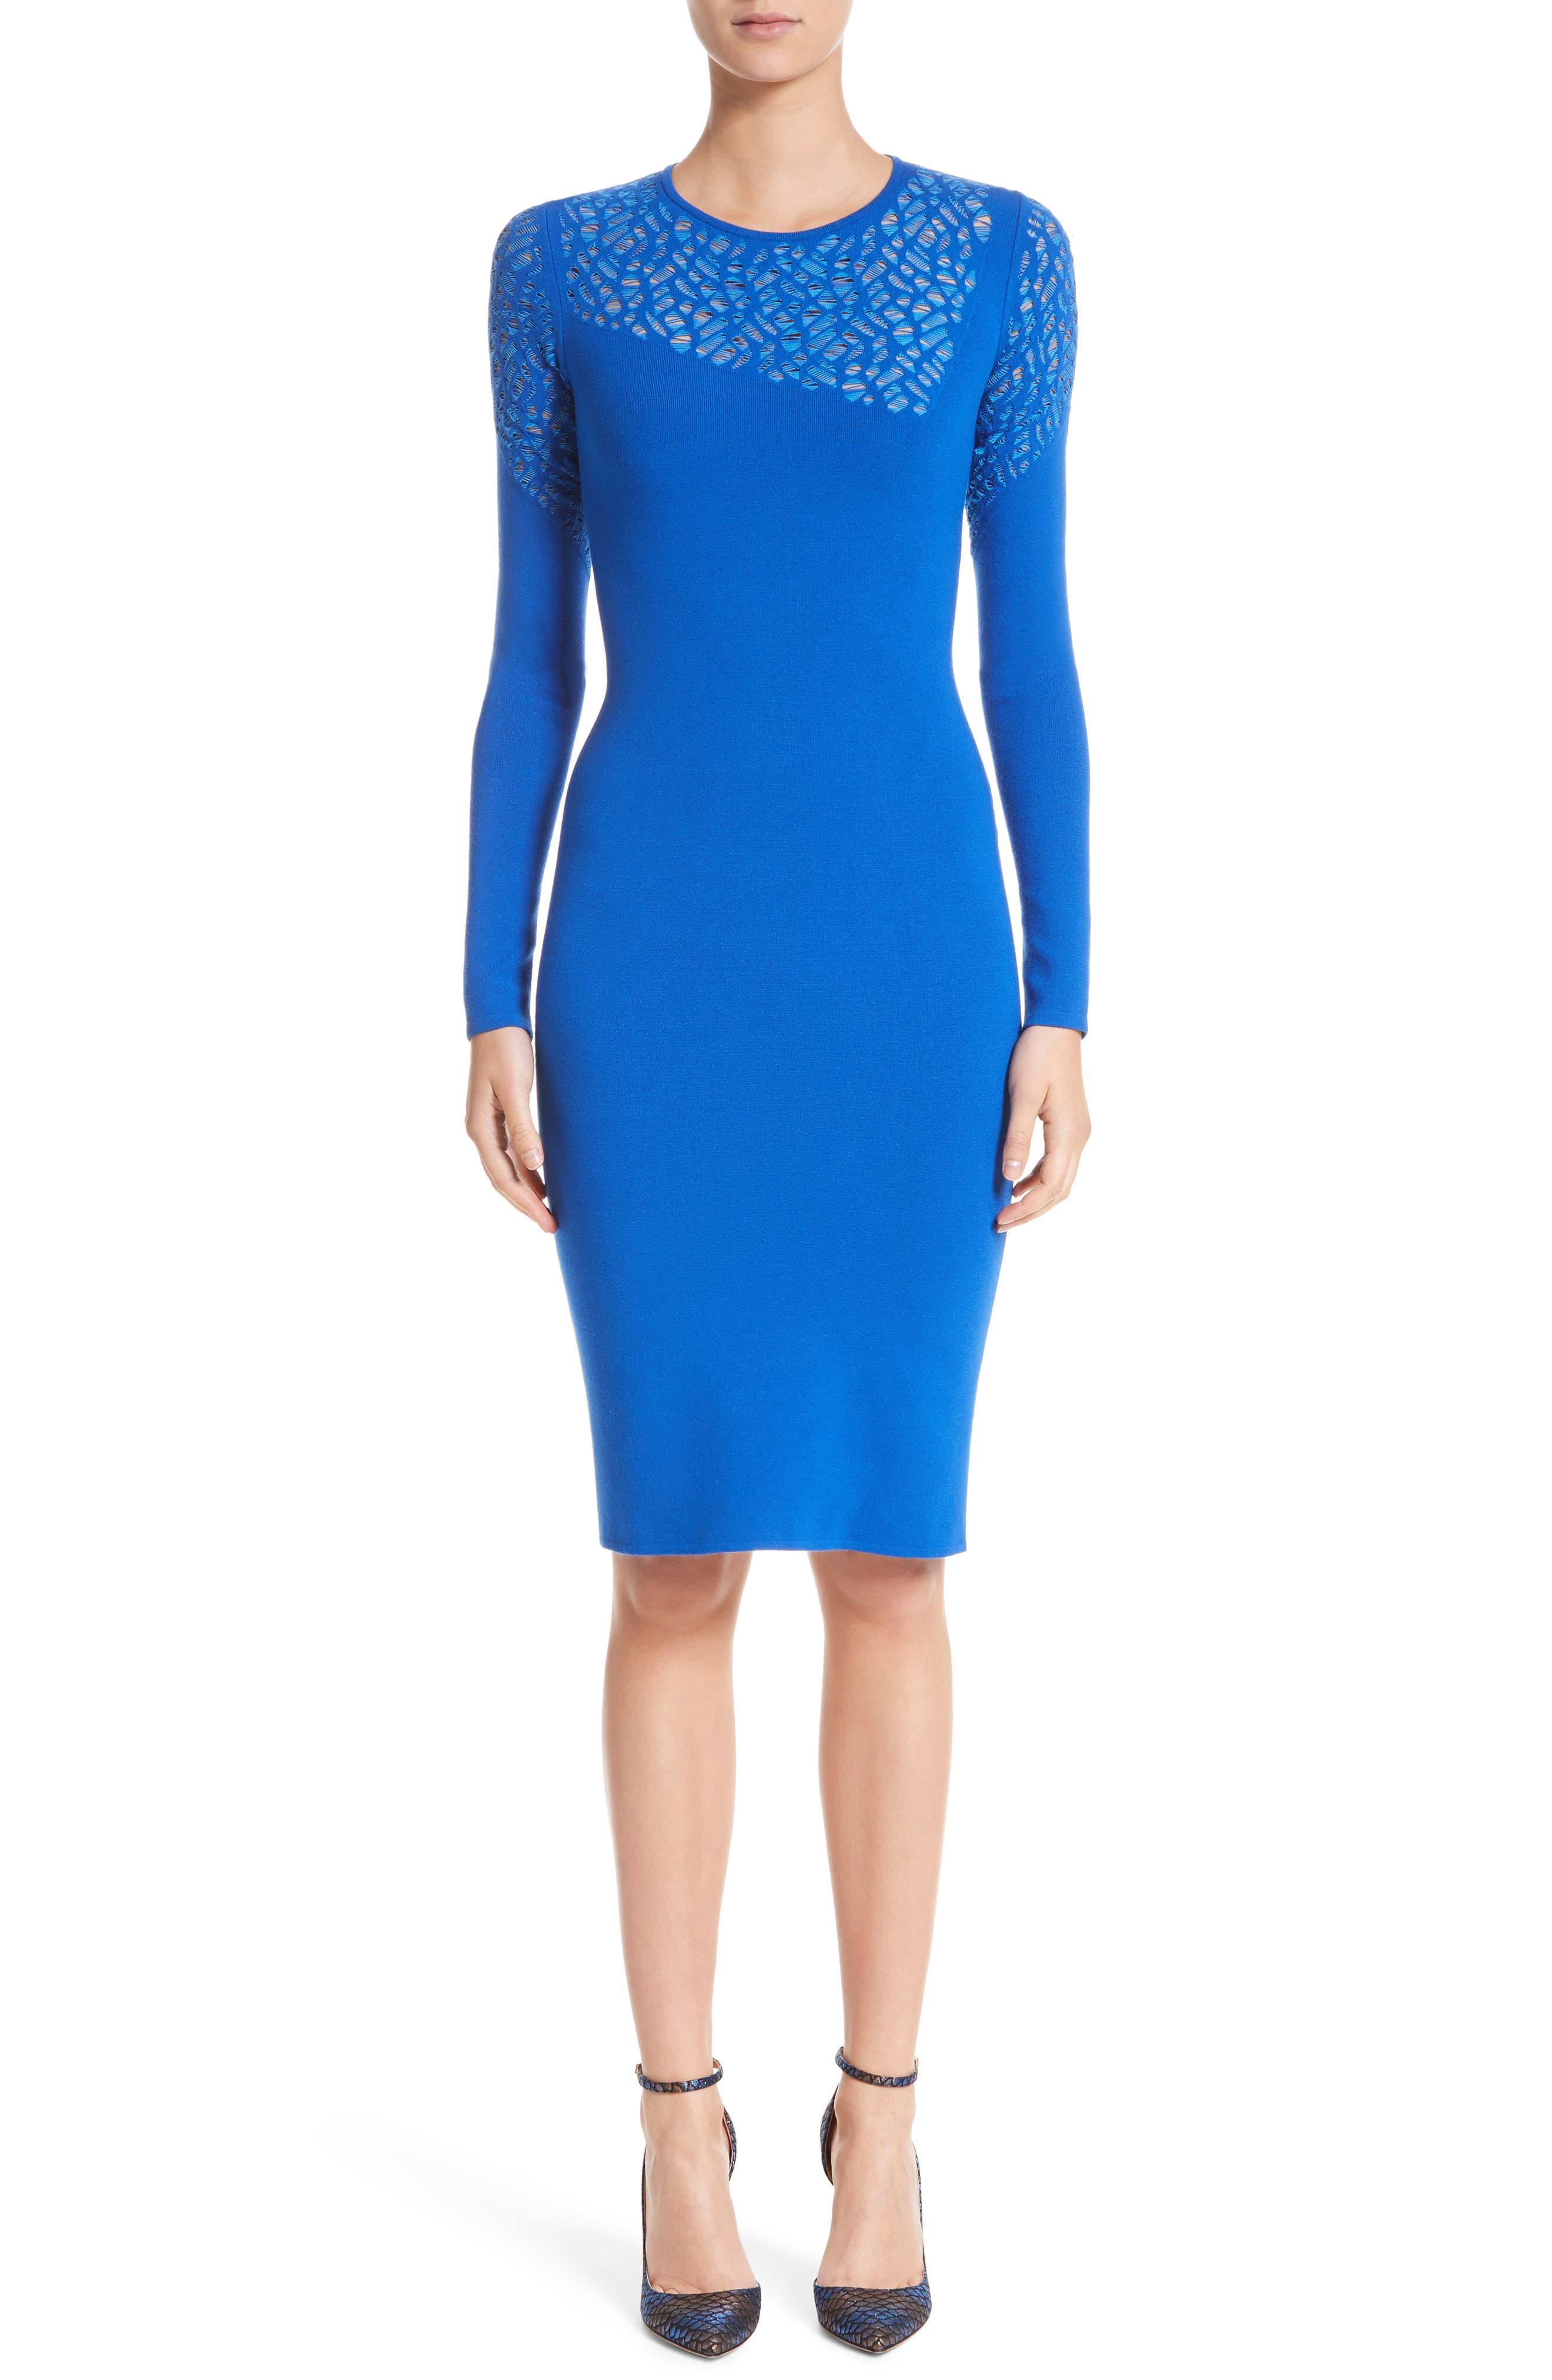 Contrast Stitch Knit Dress,                             Main thumbnail 1, color,                             Royal Blue/ Light Blue